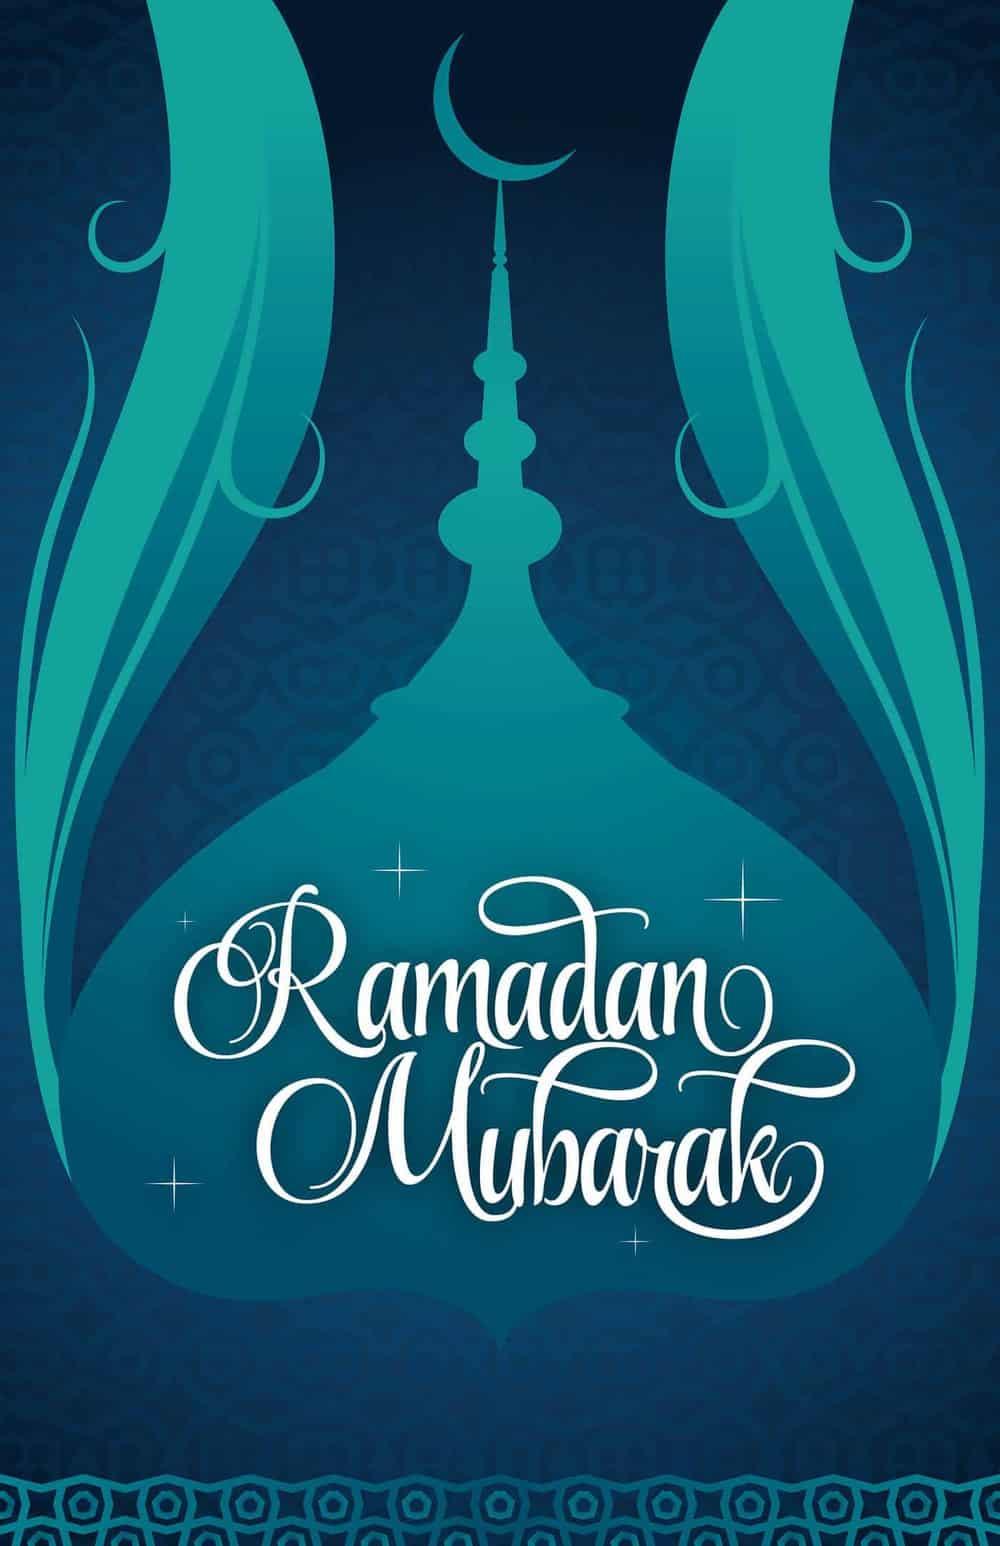 Ramadan Mubarak Card Template On Vectogravic Design